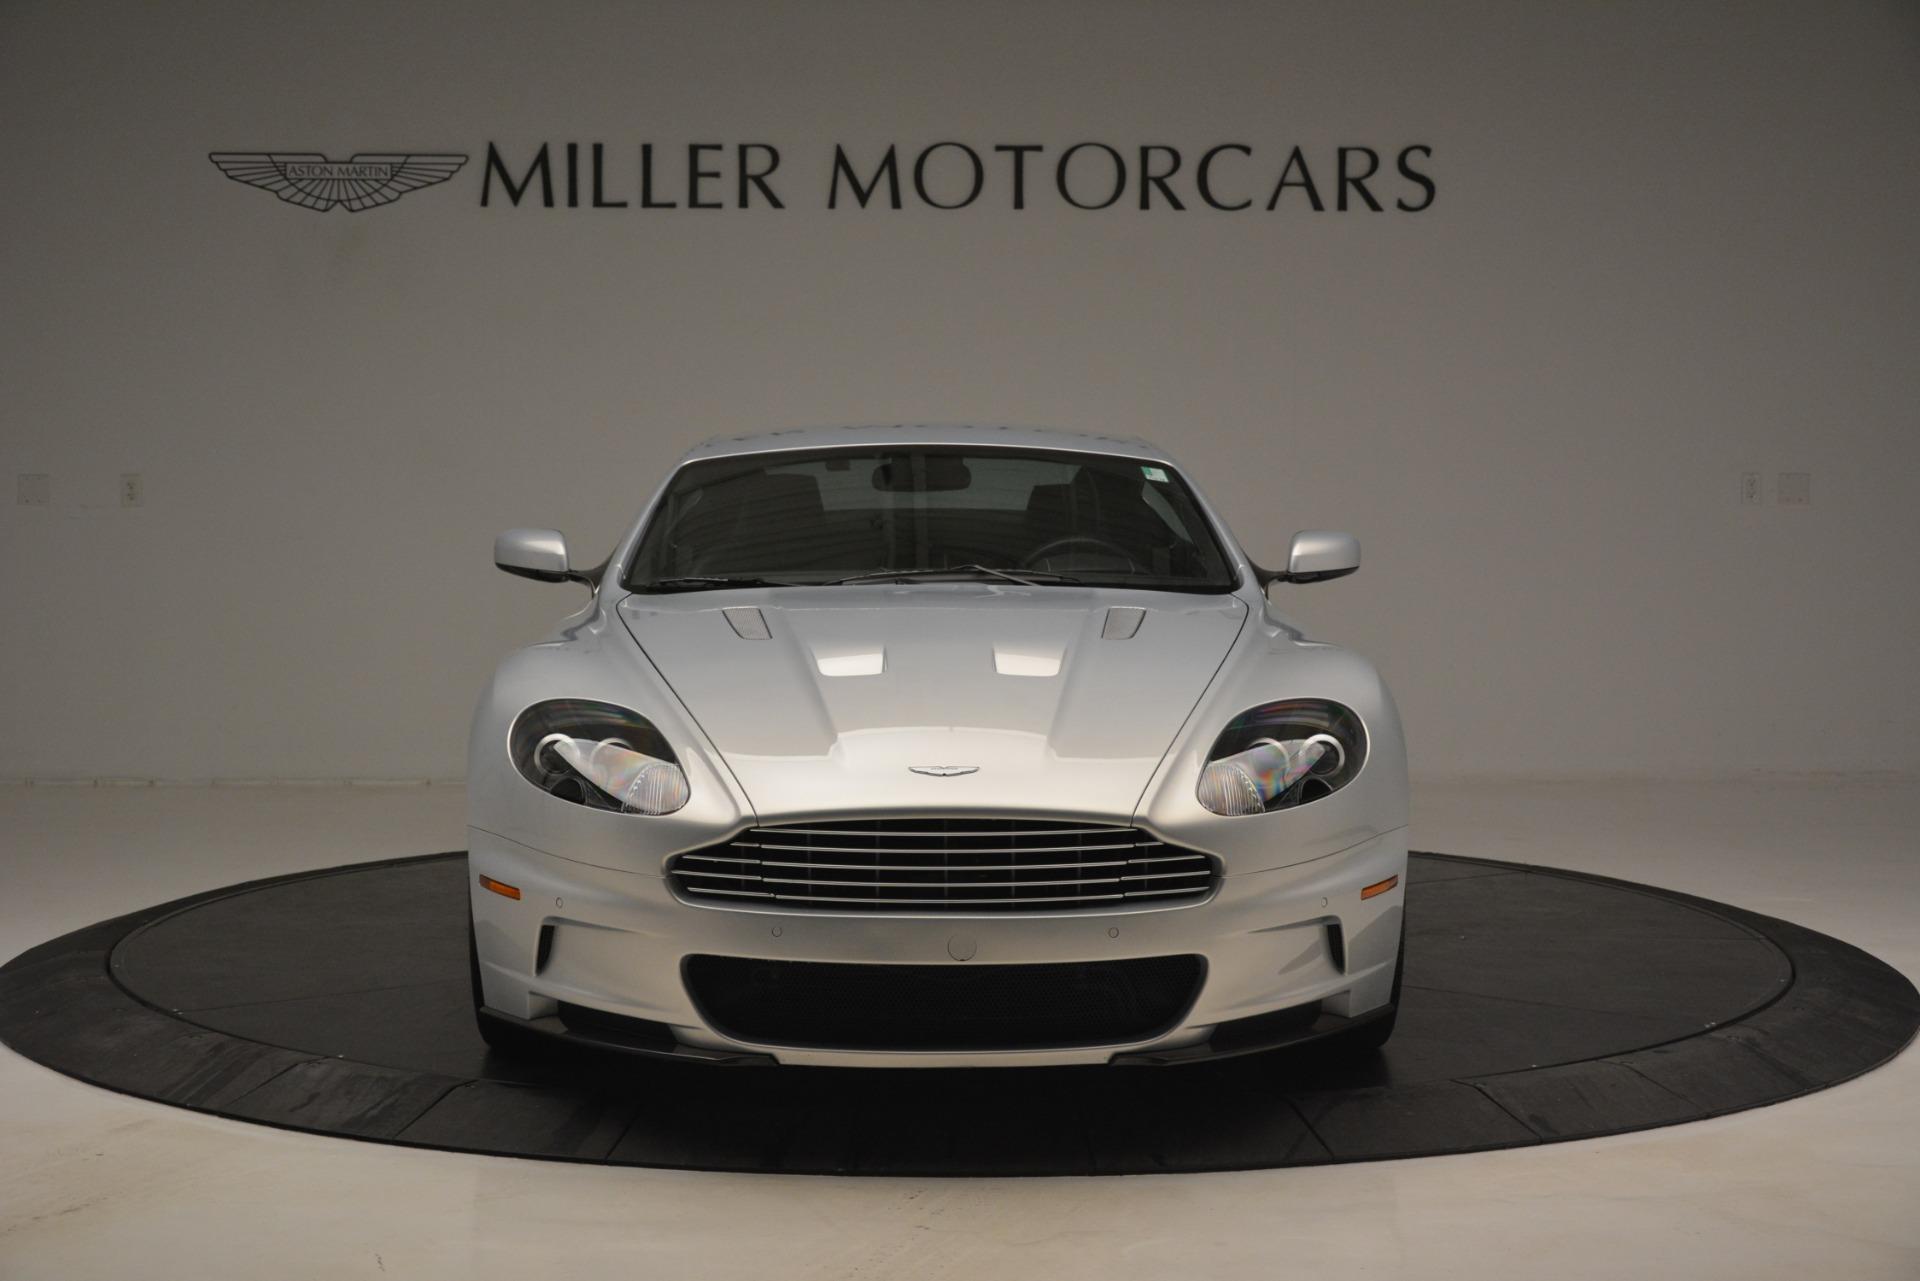 Used 2009 Aston Martin DBS Coupe